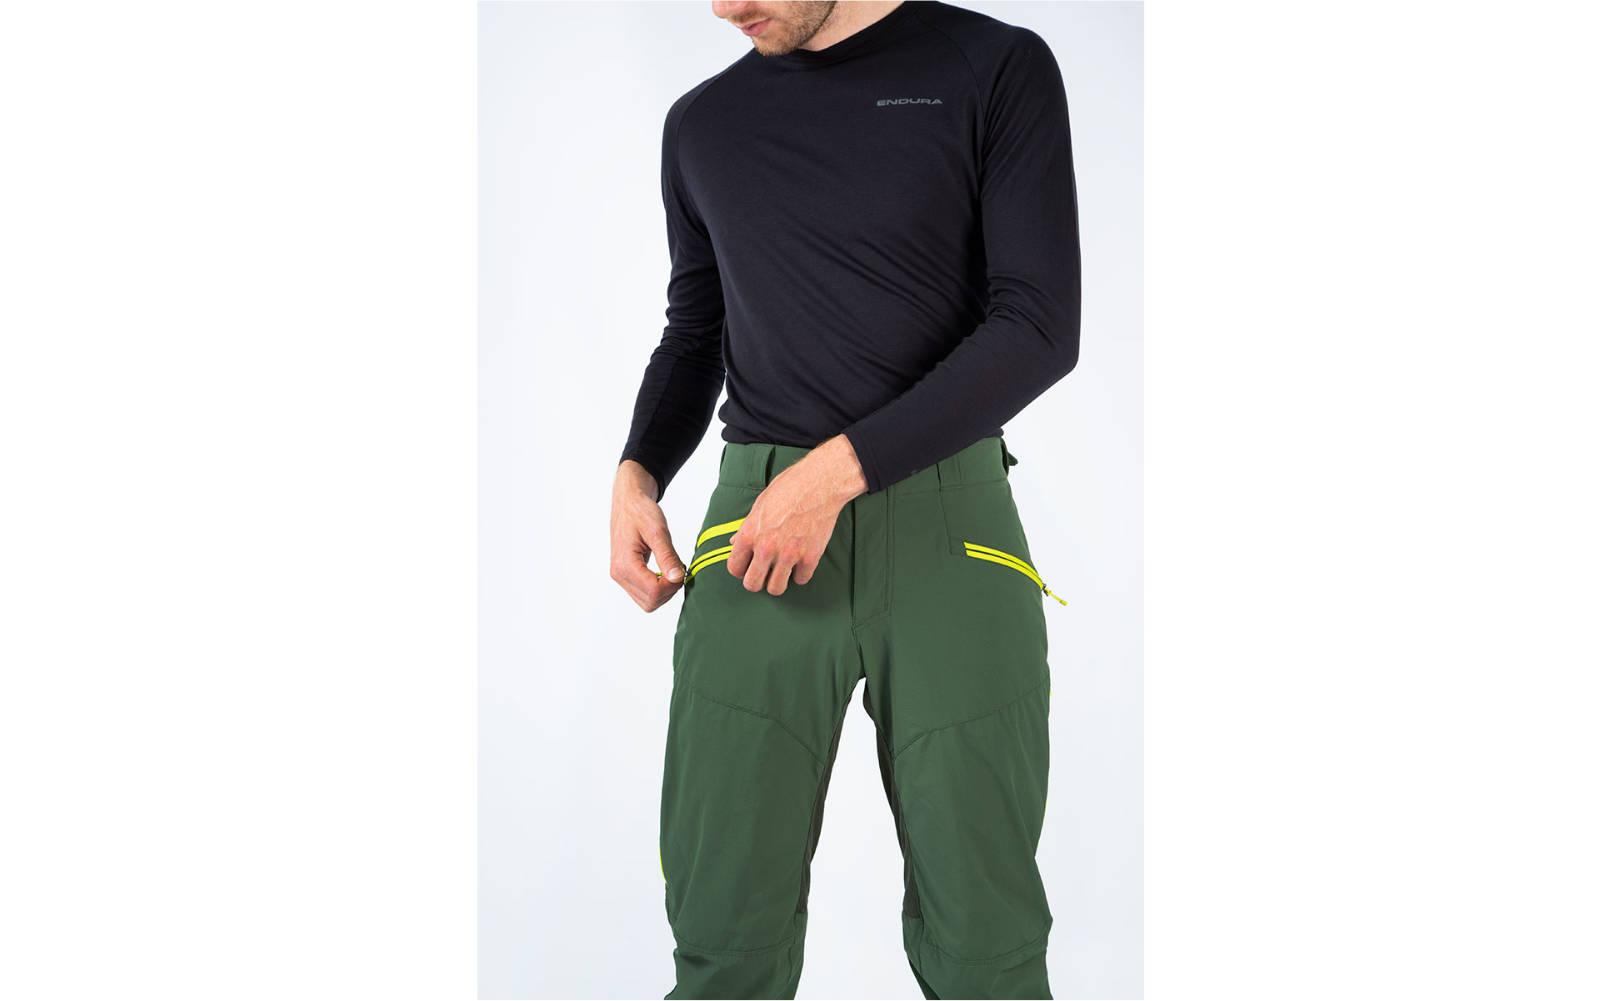 Endura SingleTrack II Trouser in Forest Green - Front Casual Model